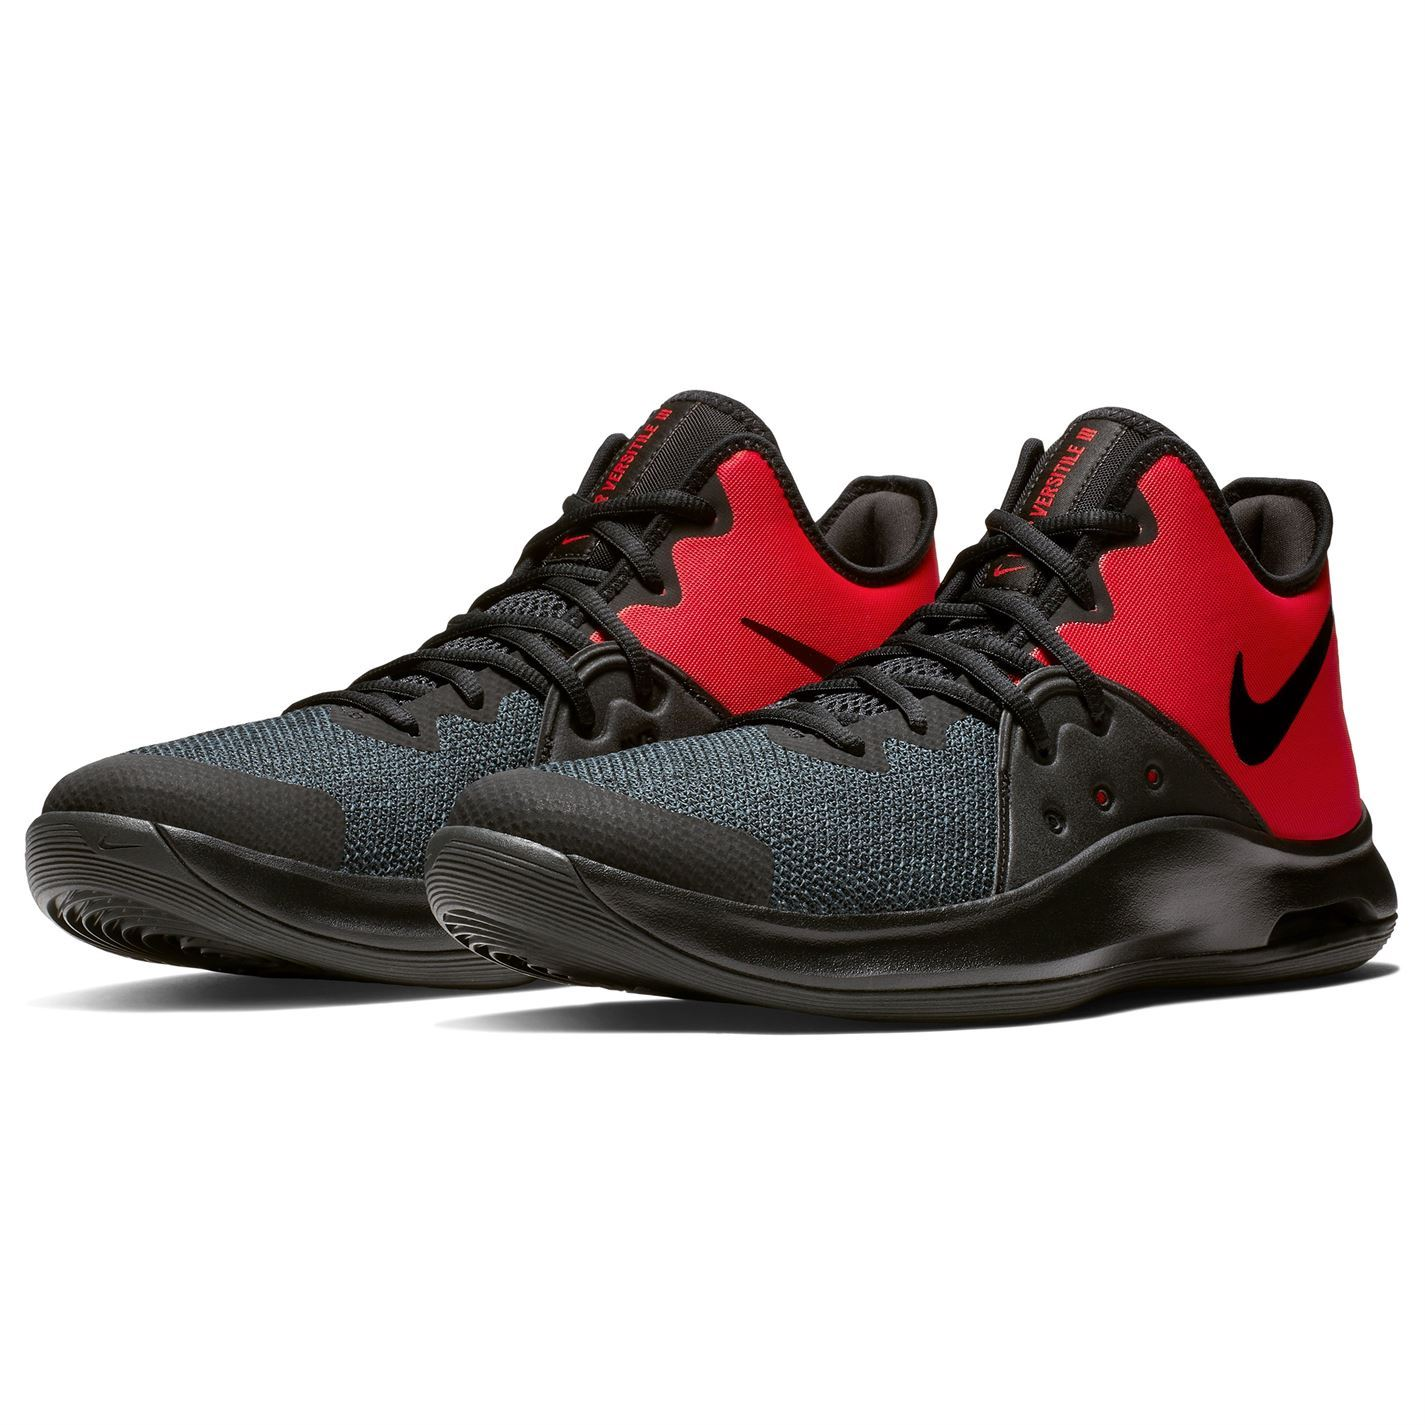 Nike Aria Versatile 3 Scarpe da Basket Uomo Ginnastica